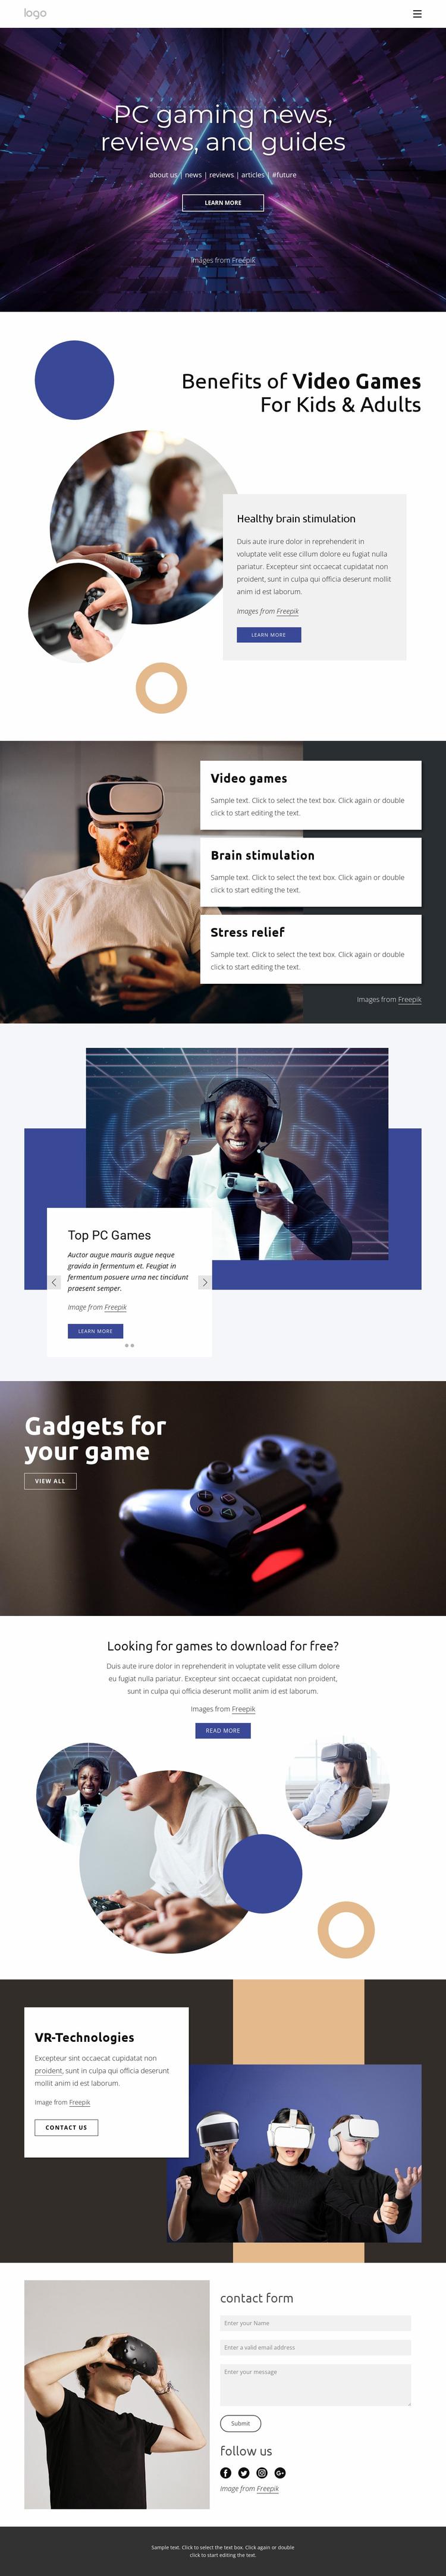 PC gaming news Website Design